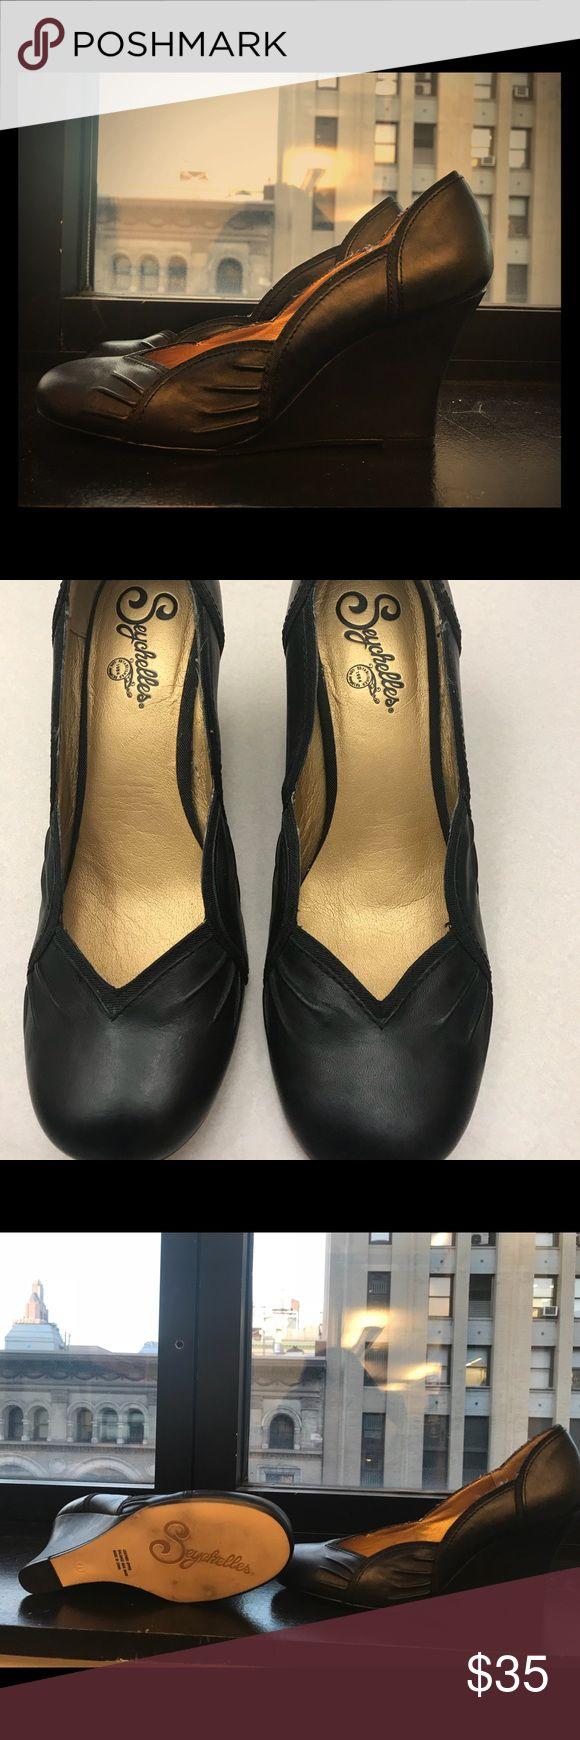 Black Seychelles Wedge Shoes Black Seychelles Wedge only worn once Seychelles Shoes Wedges